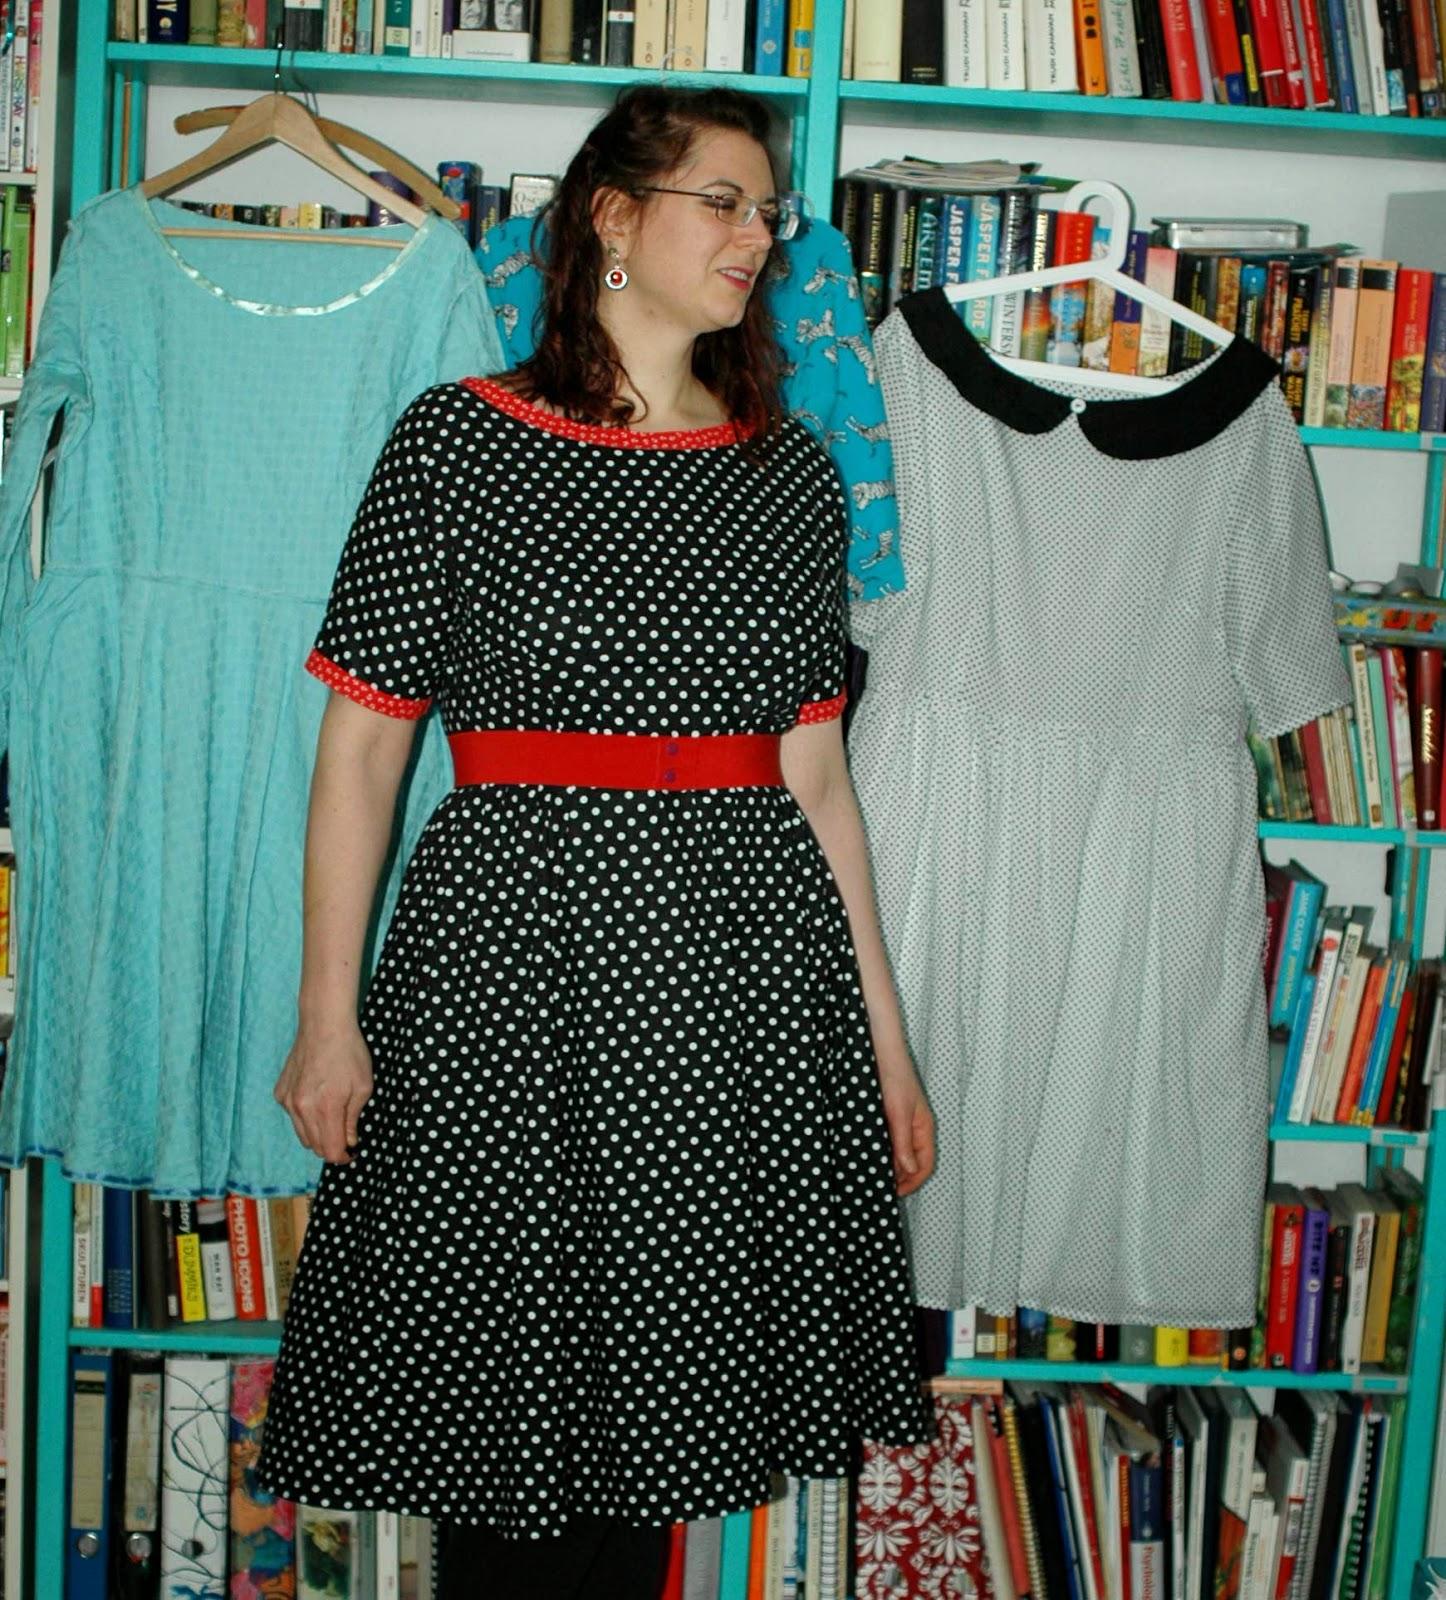 http://morvenshandmades.blogspot.de/2015/02/polkadot-dress-with-vintage-attitude.html